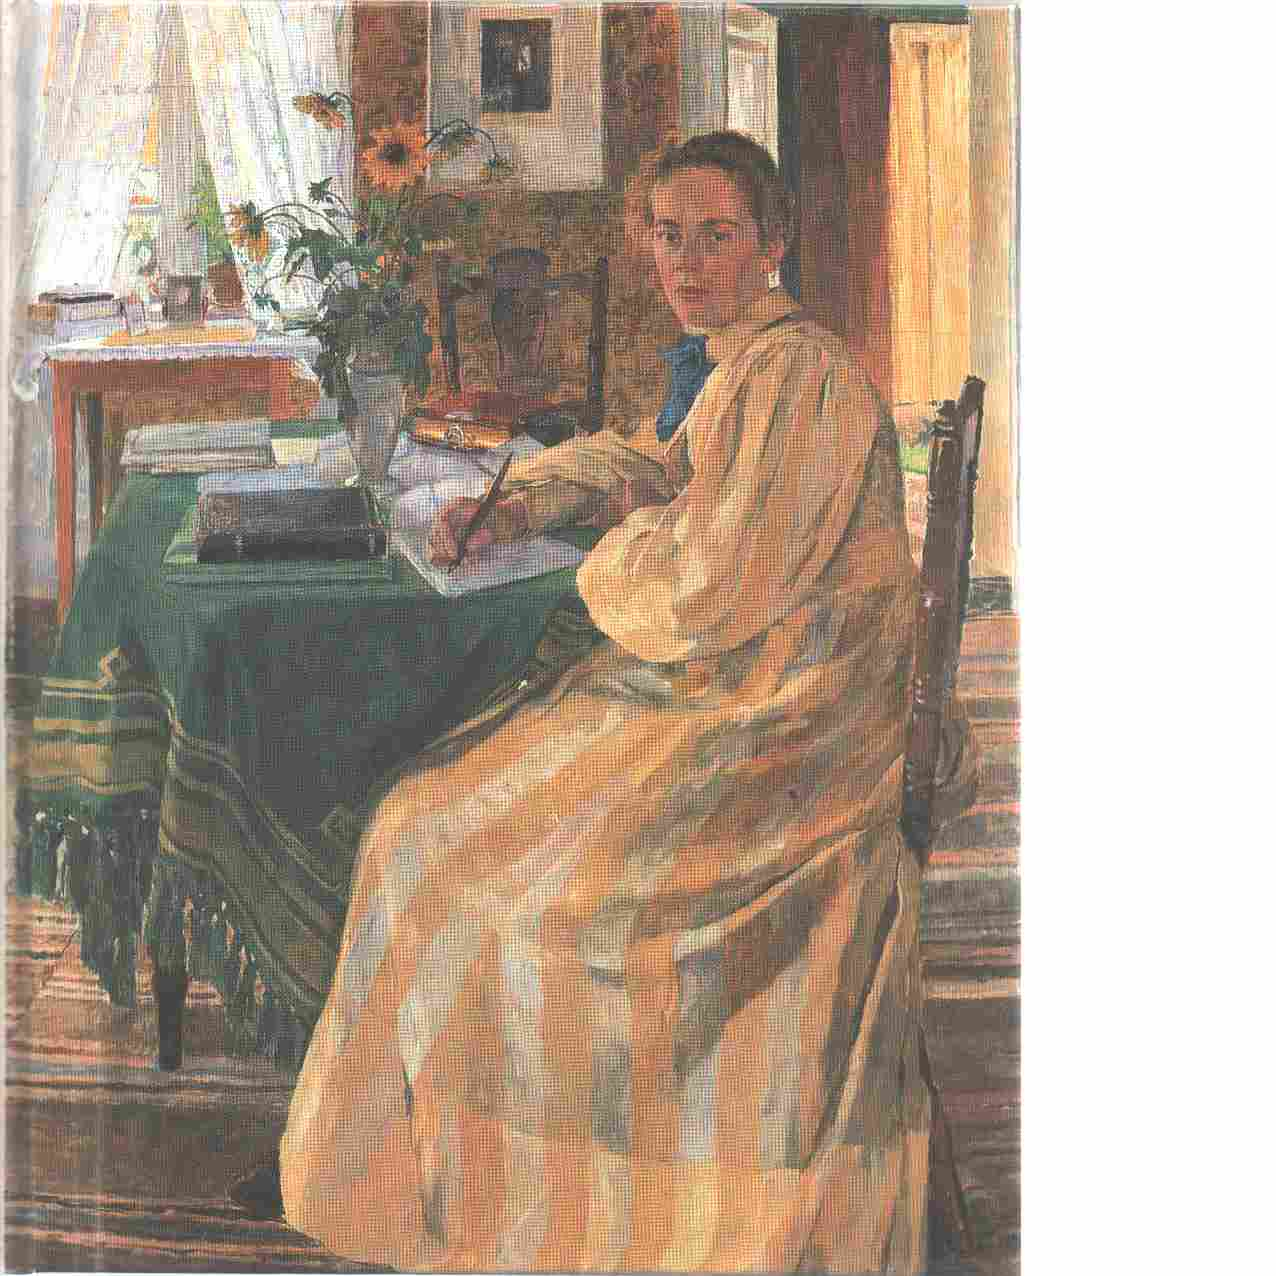 Hemma i konsten : Nationalmuseum 15.10.1987-6.1.1988 / katalogredaktion - Red.